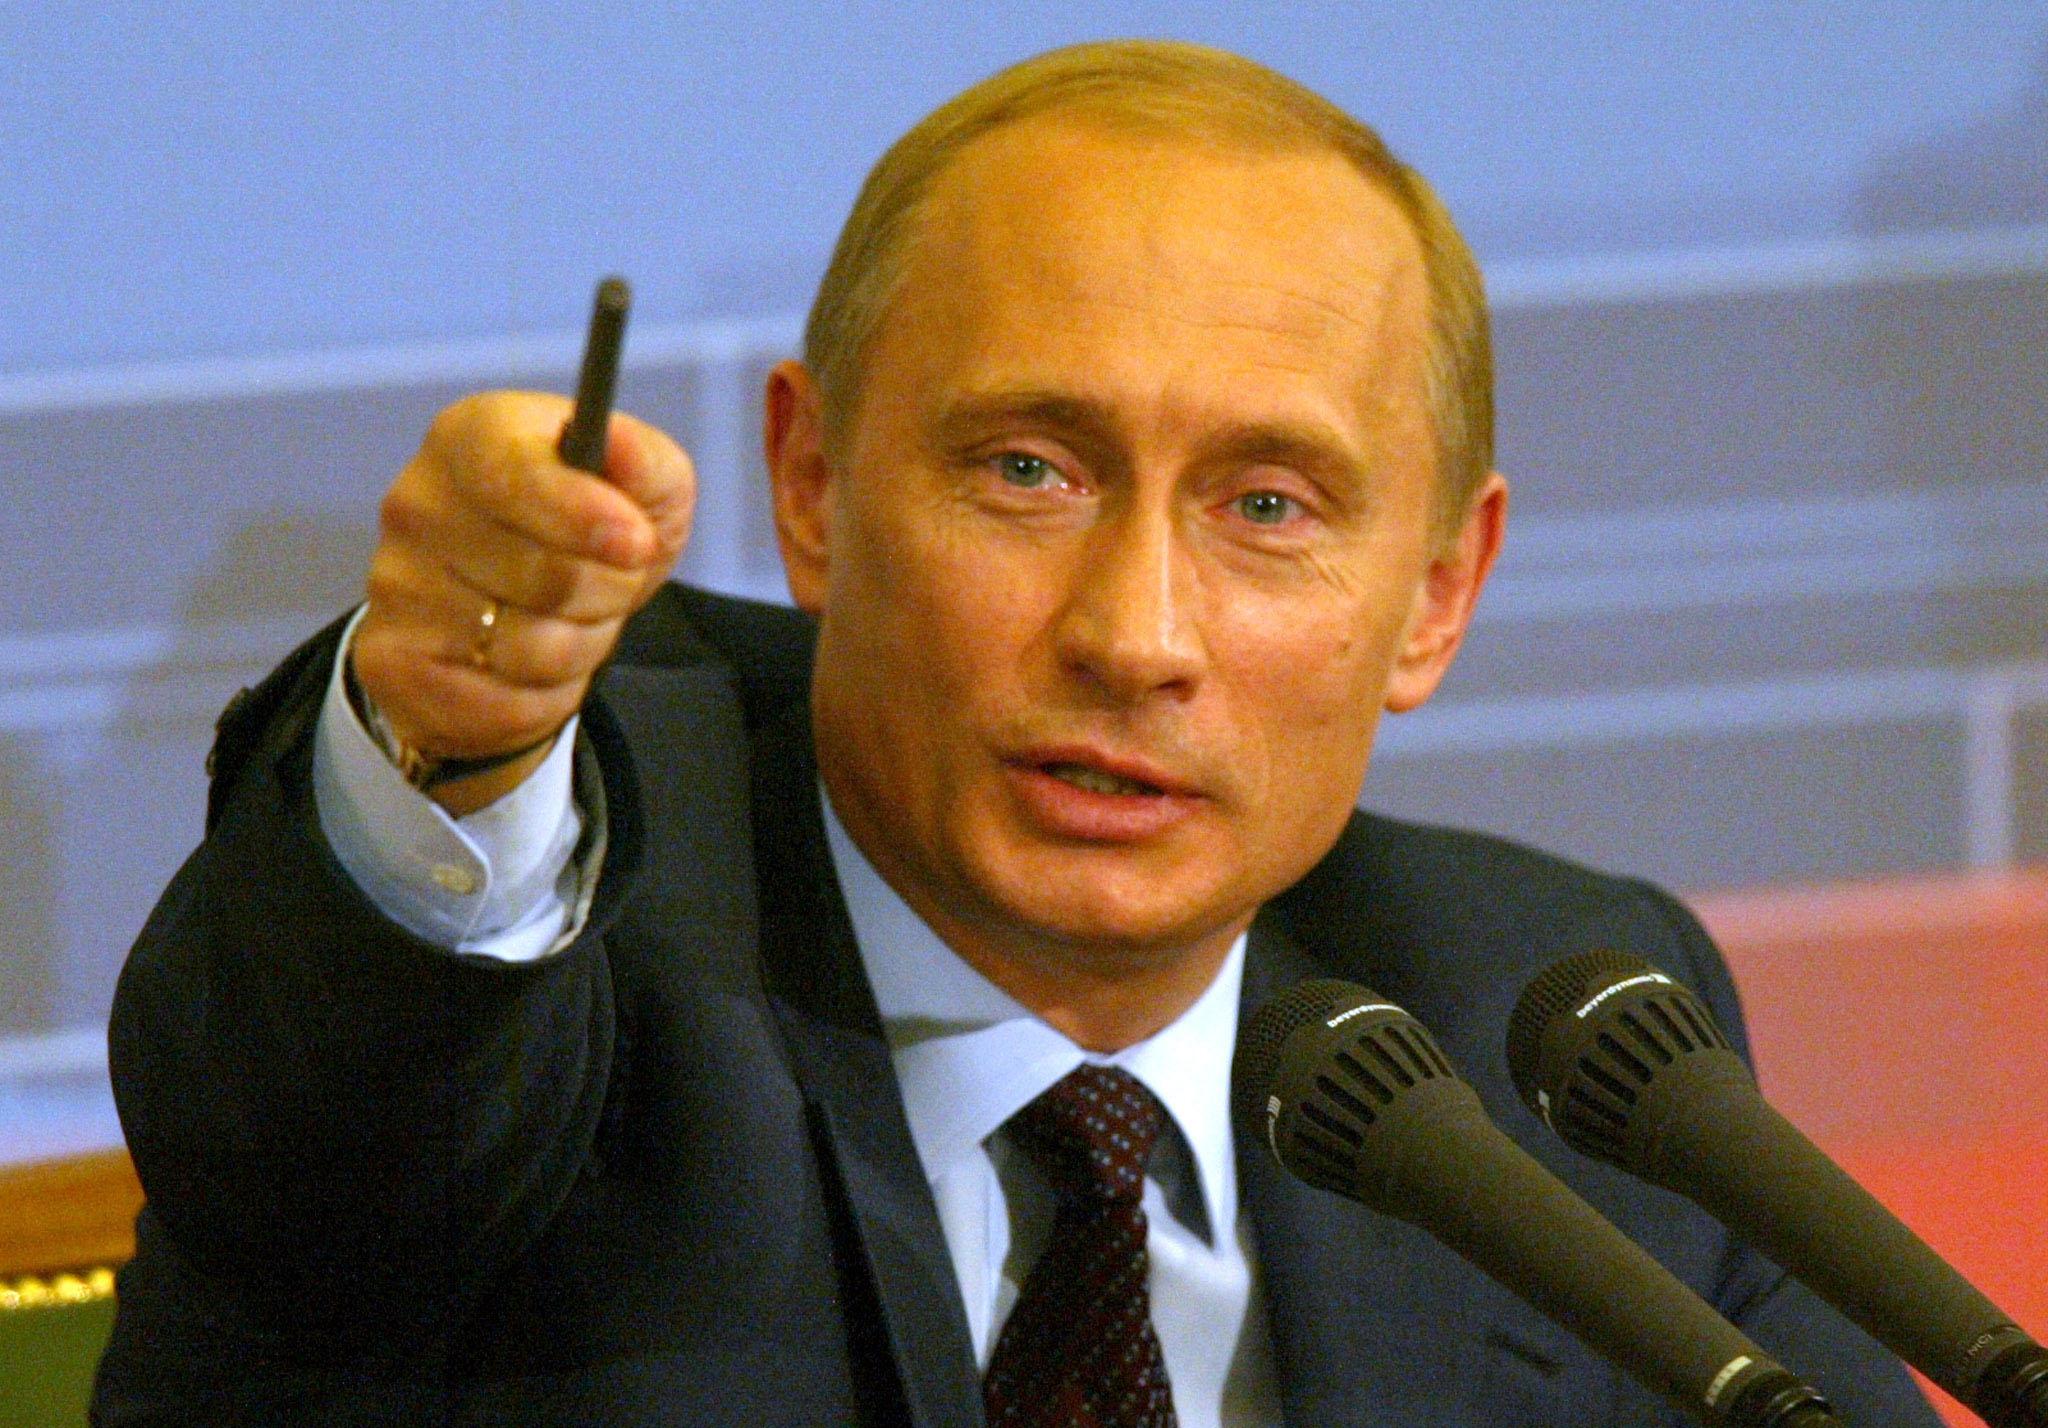 Путин: вот эти парни 2048x1428 586KB Знаменитости